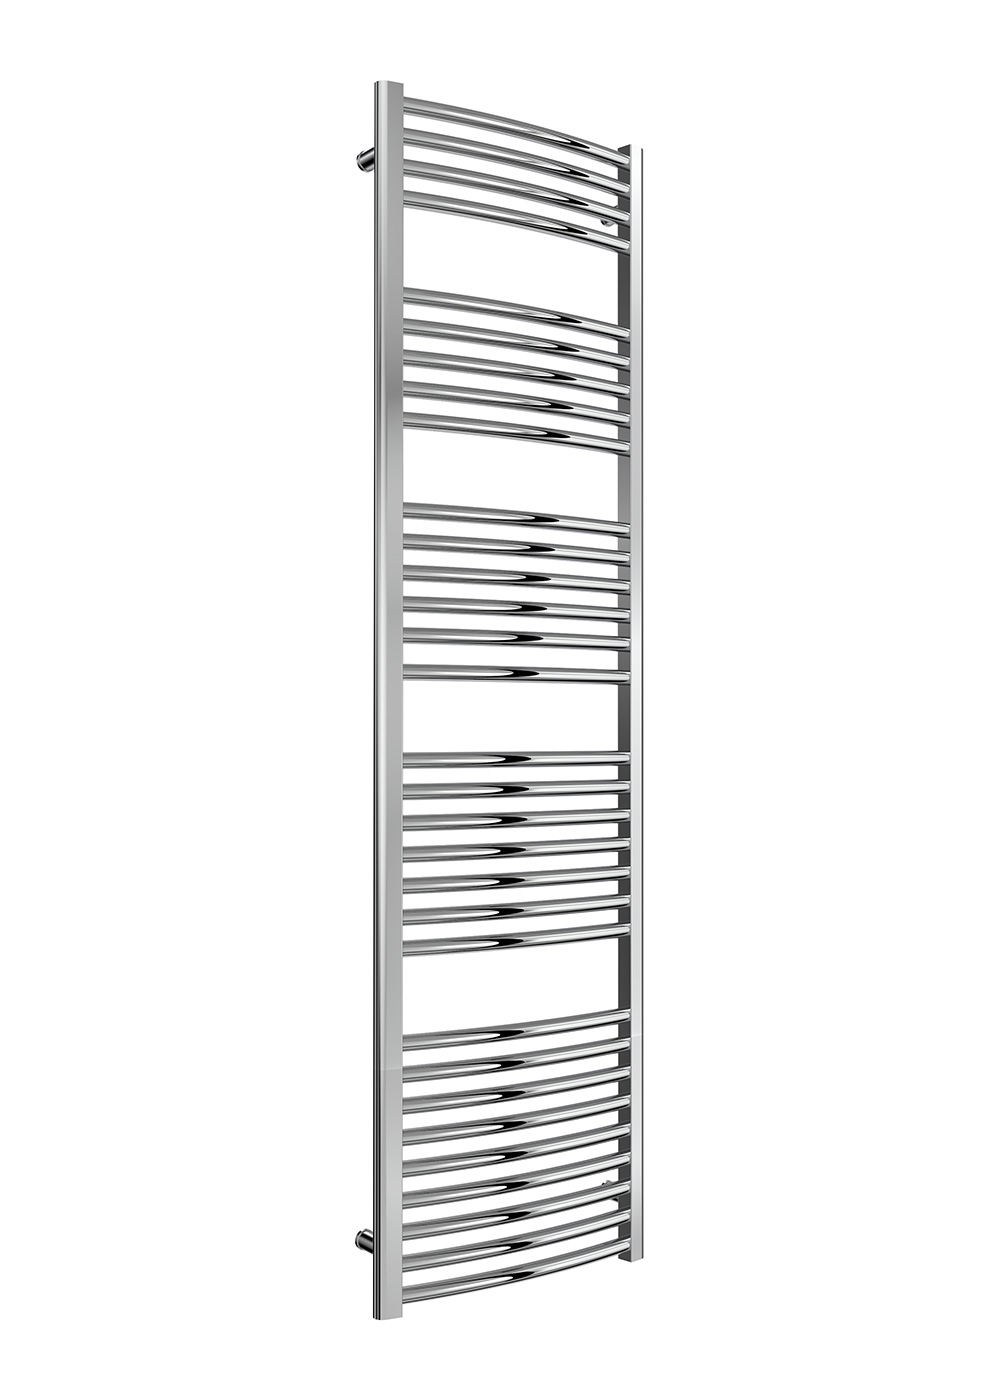 Reina Diva Straight Heated Towel Rail 1800mm H x 400mm W Chrome